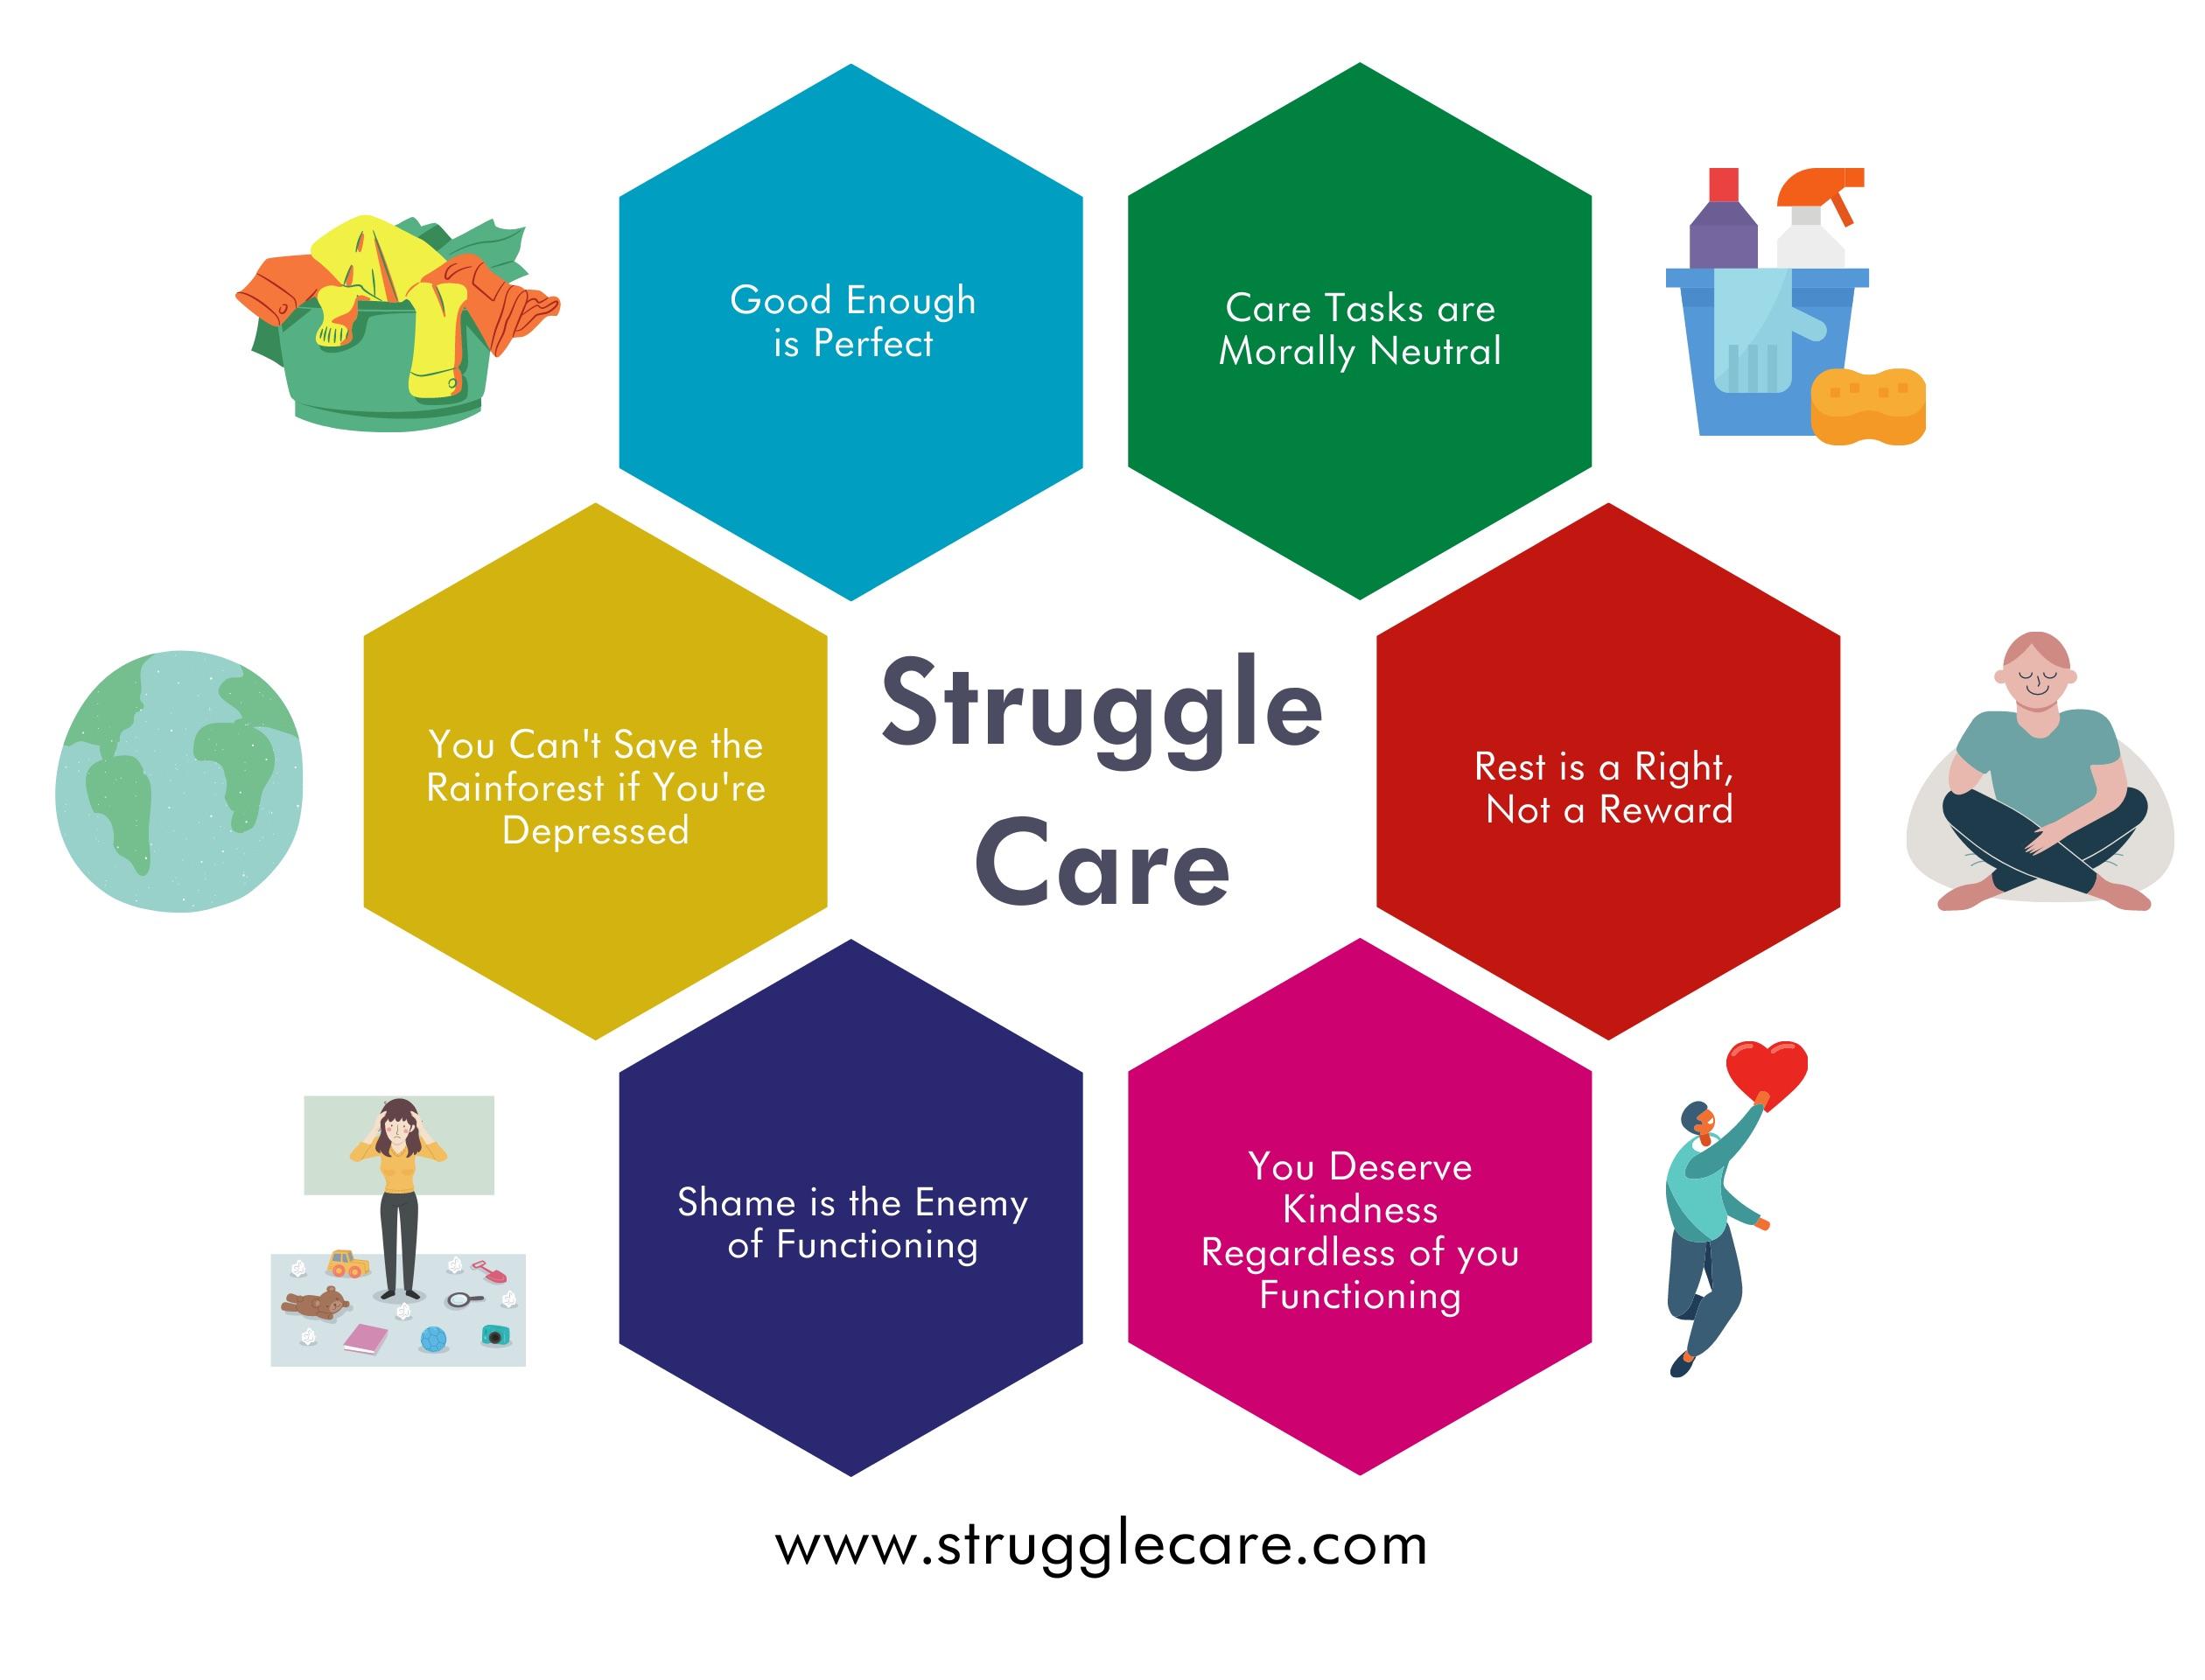 Struggle Care